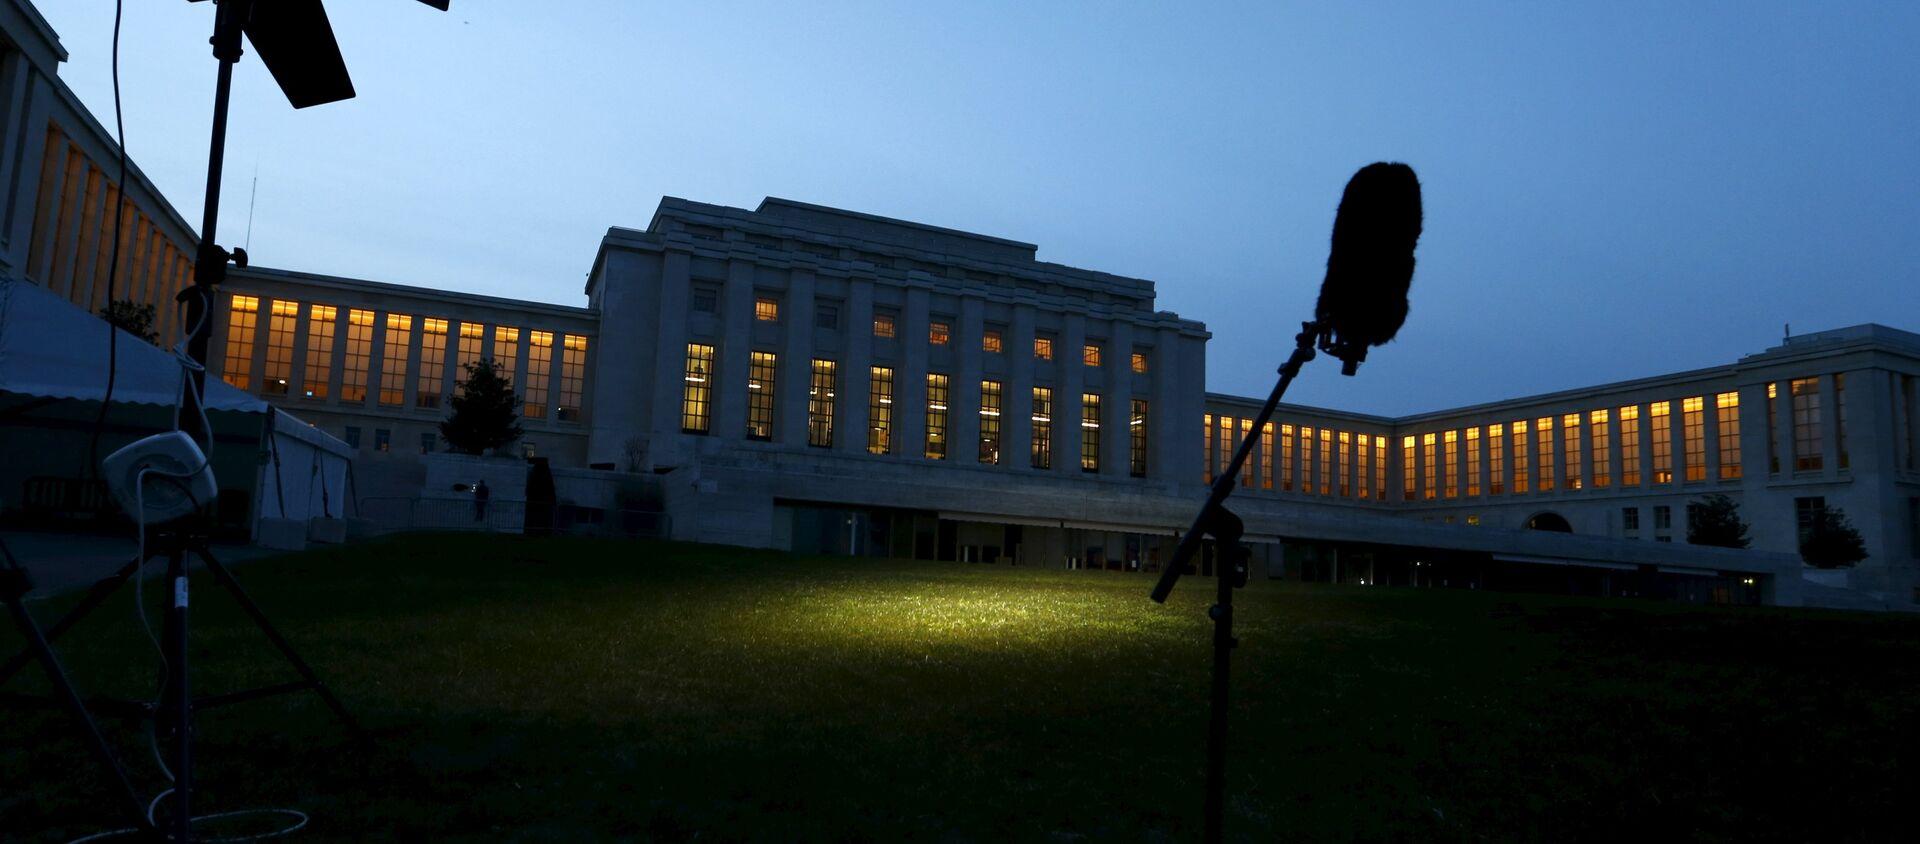 Sede de la ONU en Ginebra - Sputnik Mundo, 1920, 18.06.2020